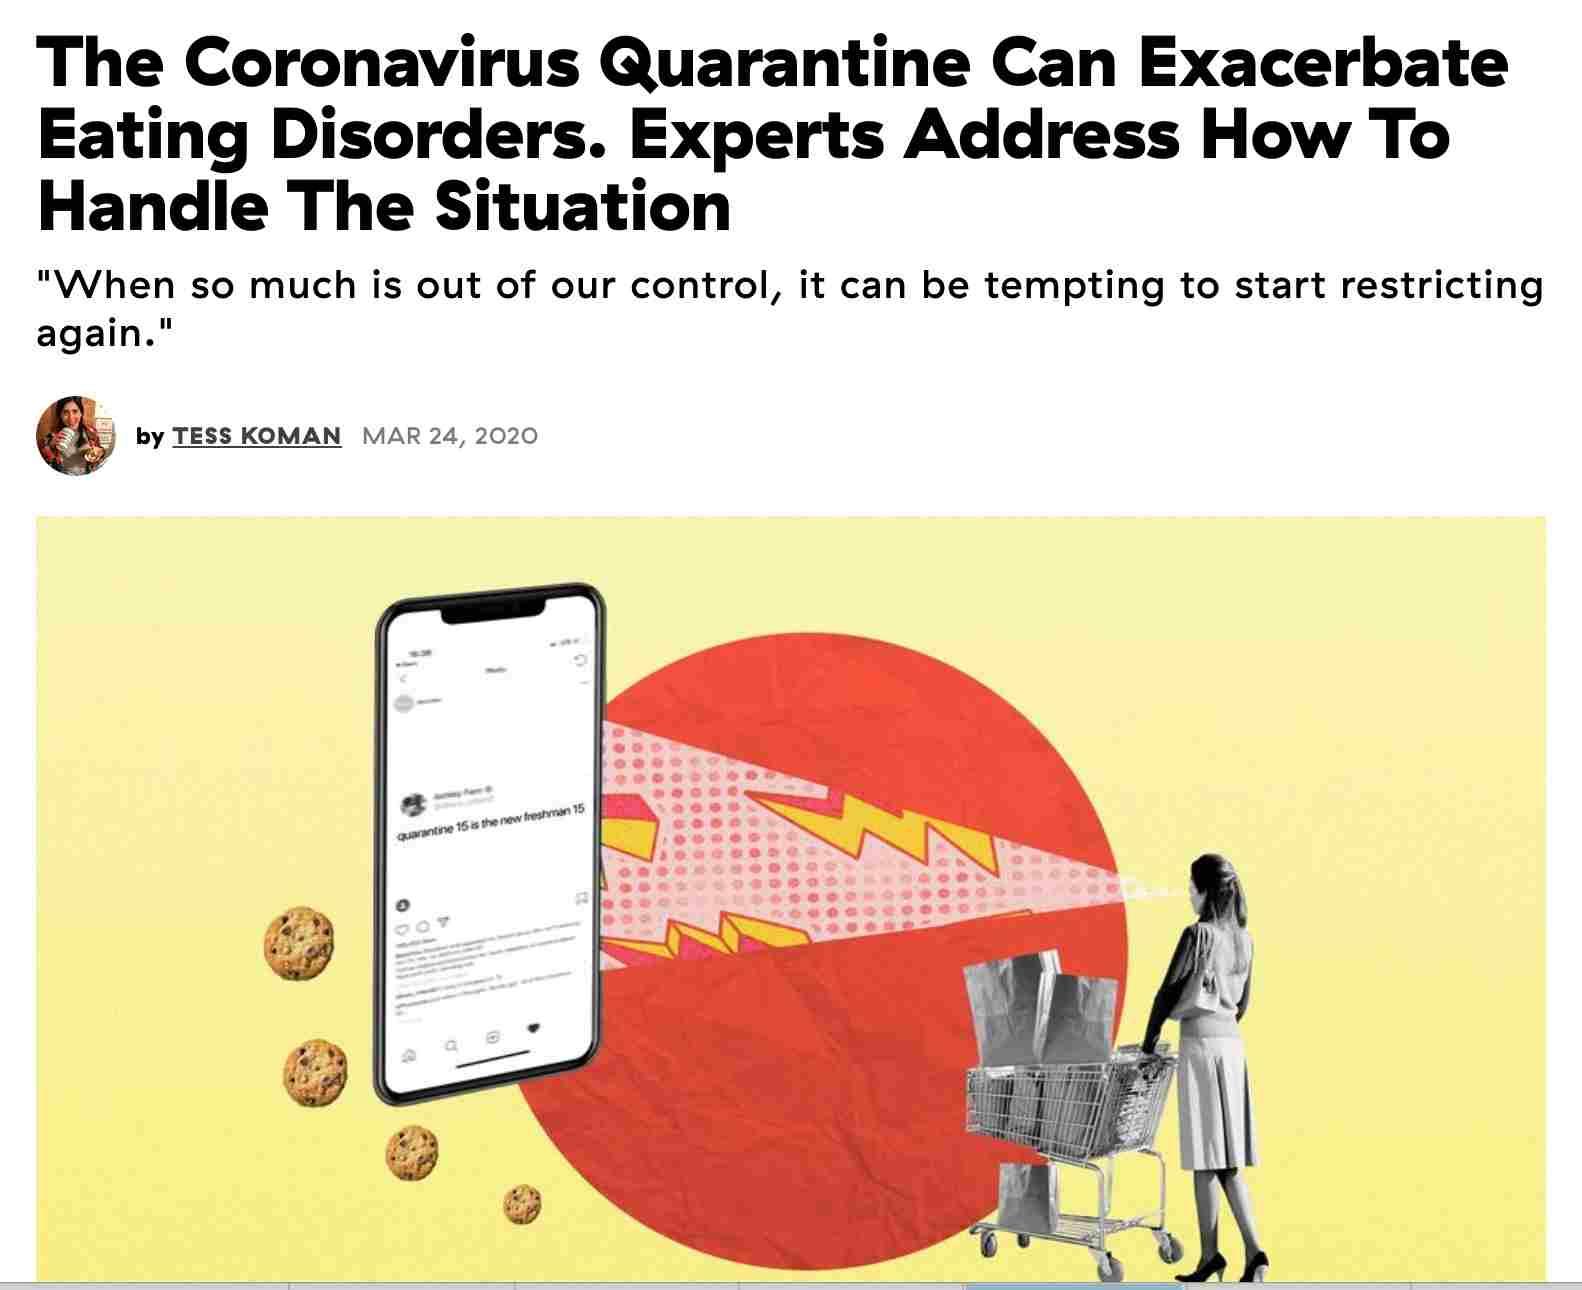 Carolina Guizar Intuitive Eating Dietitian on Delish.com